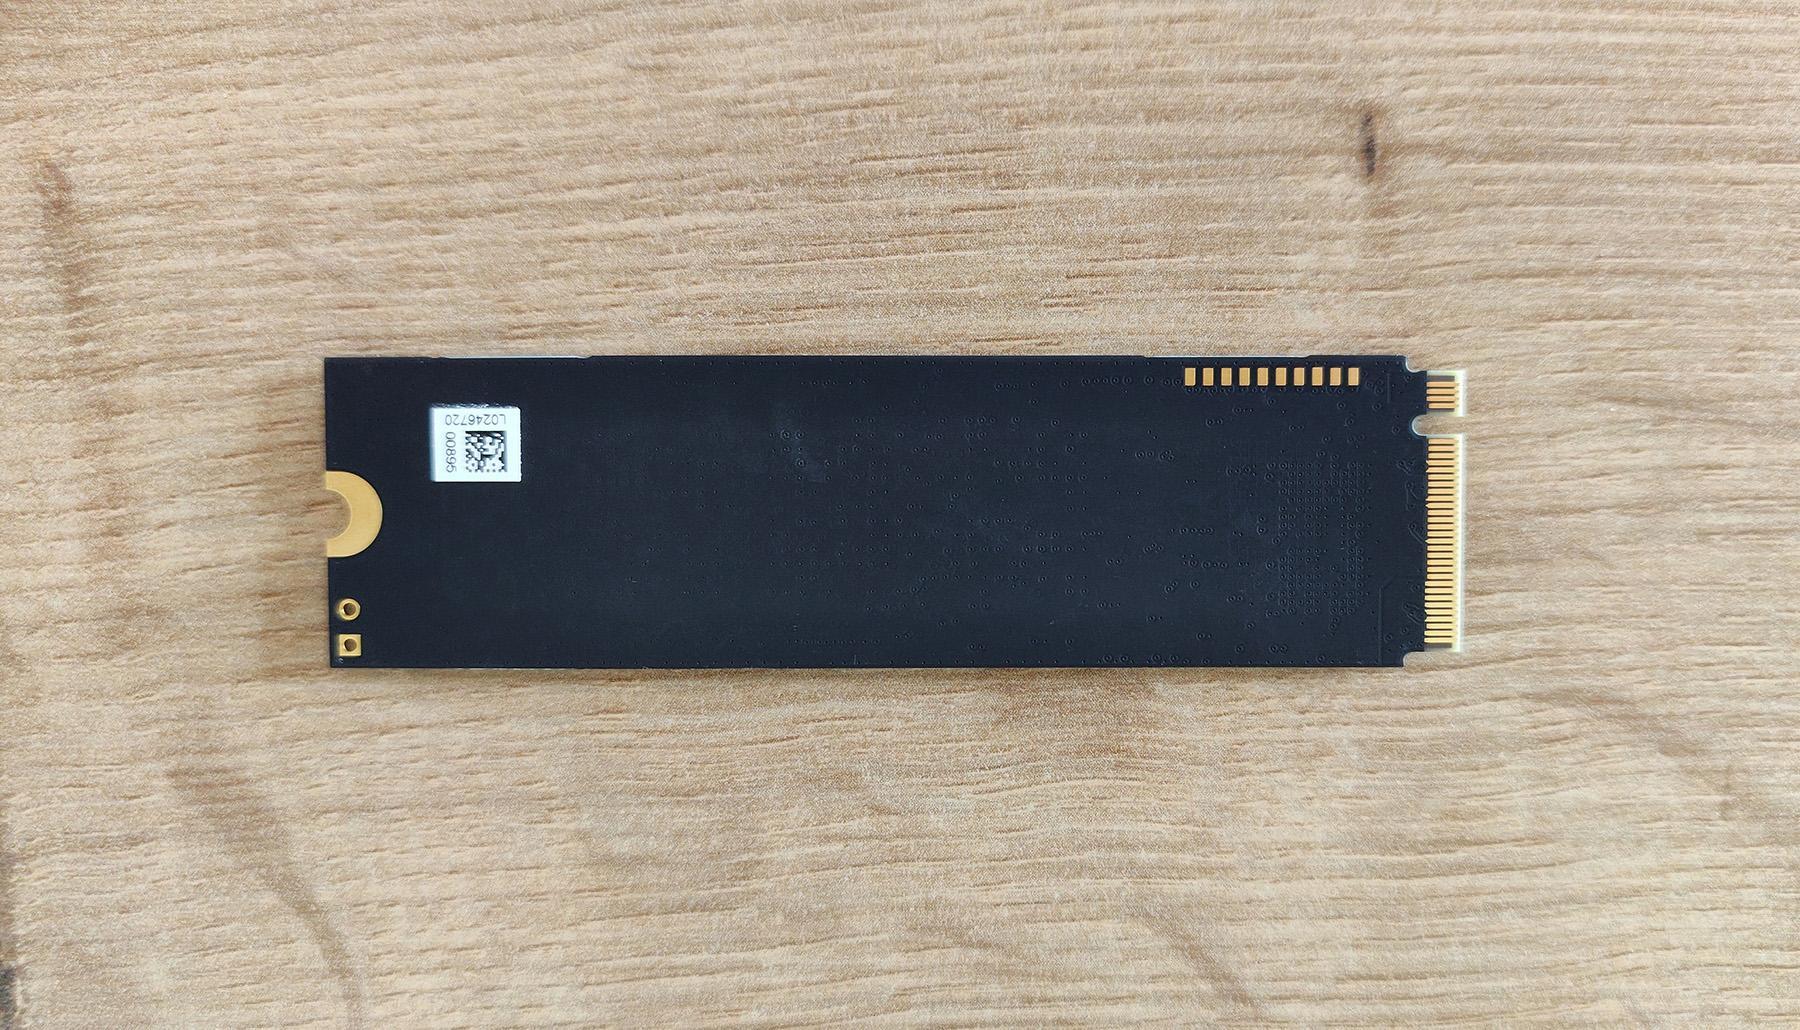 Lexar Ssd Nm620 512 Go Gb Back Omgpu Test